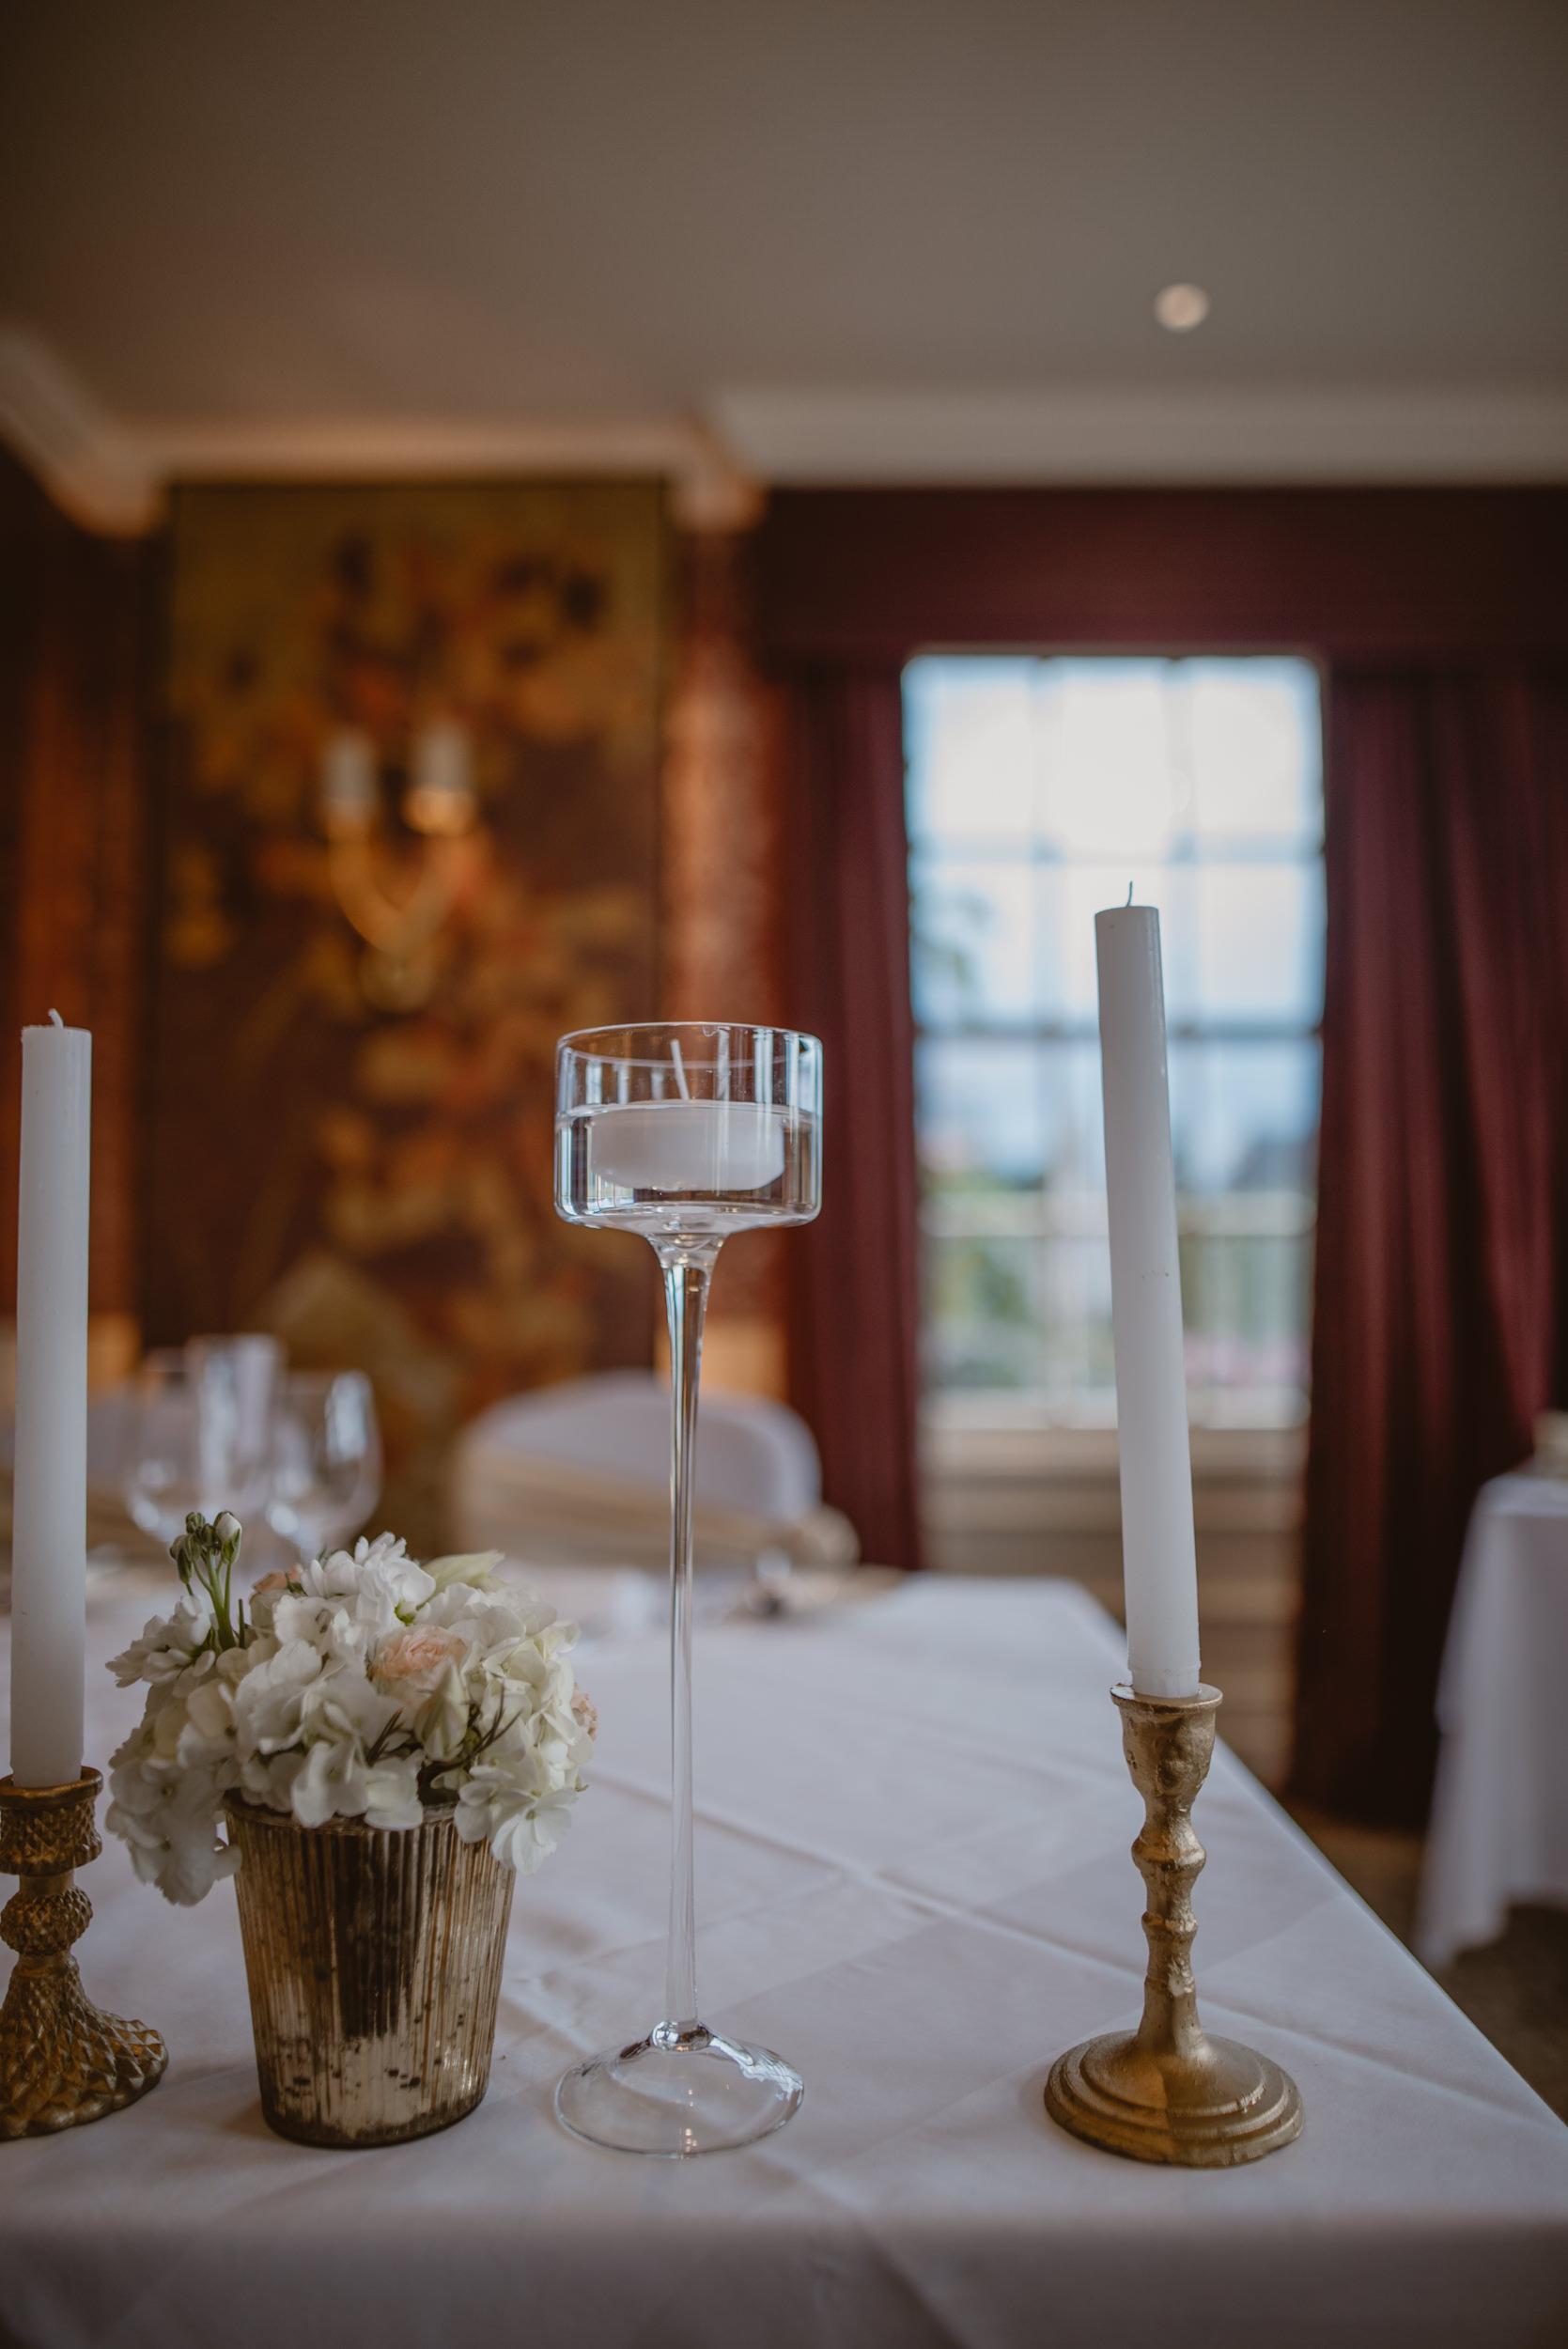 Trisha-and-Roger-wedding-The-Priory-Church-and-Chewton-Glen-Hotel-Christchurch-Manu-Mendoza-Wedding-Photography-281.jpg